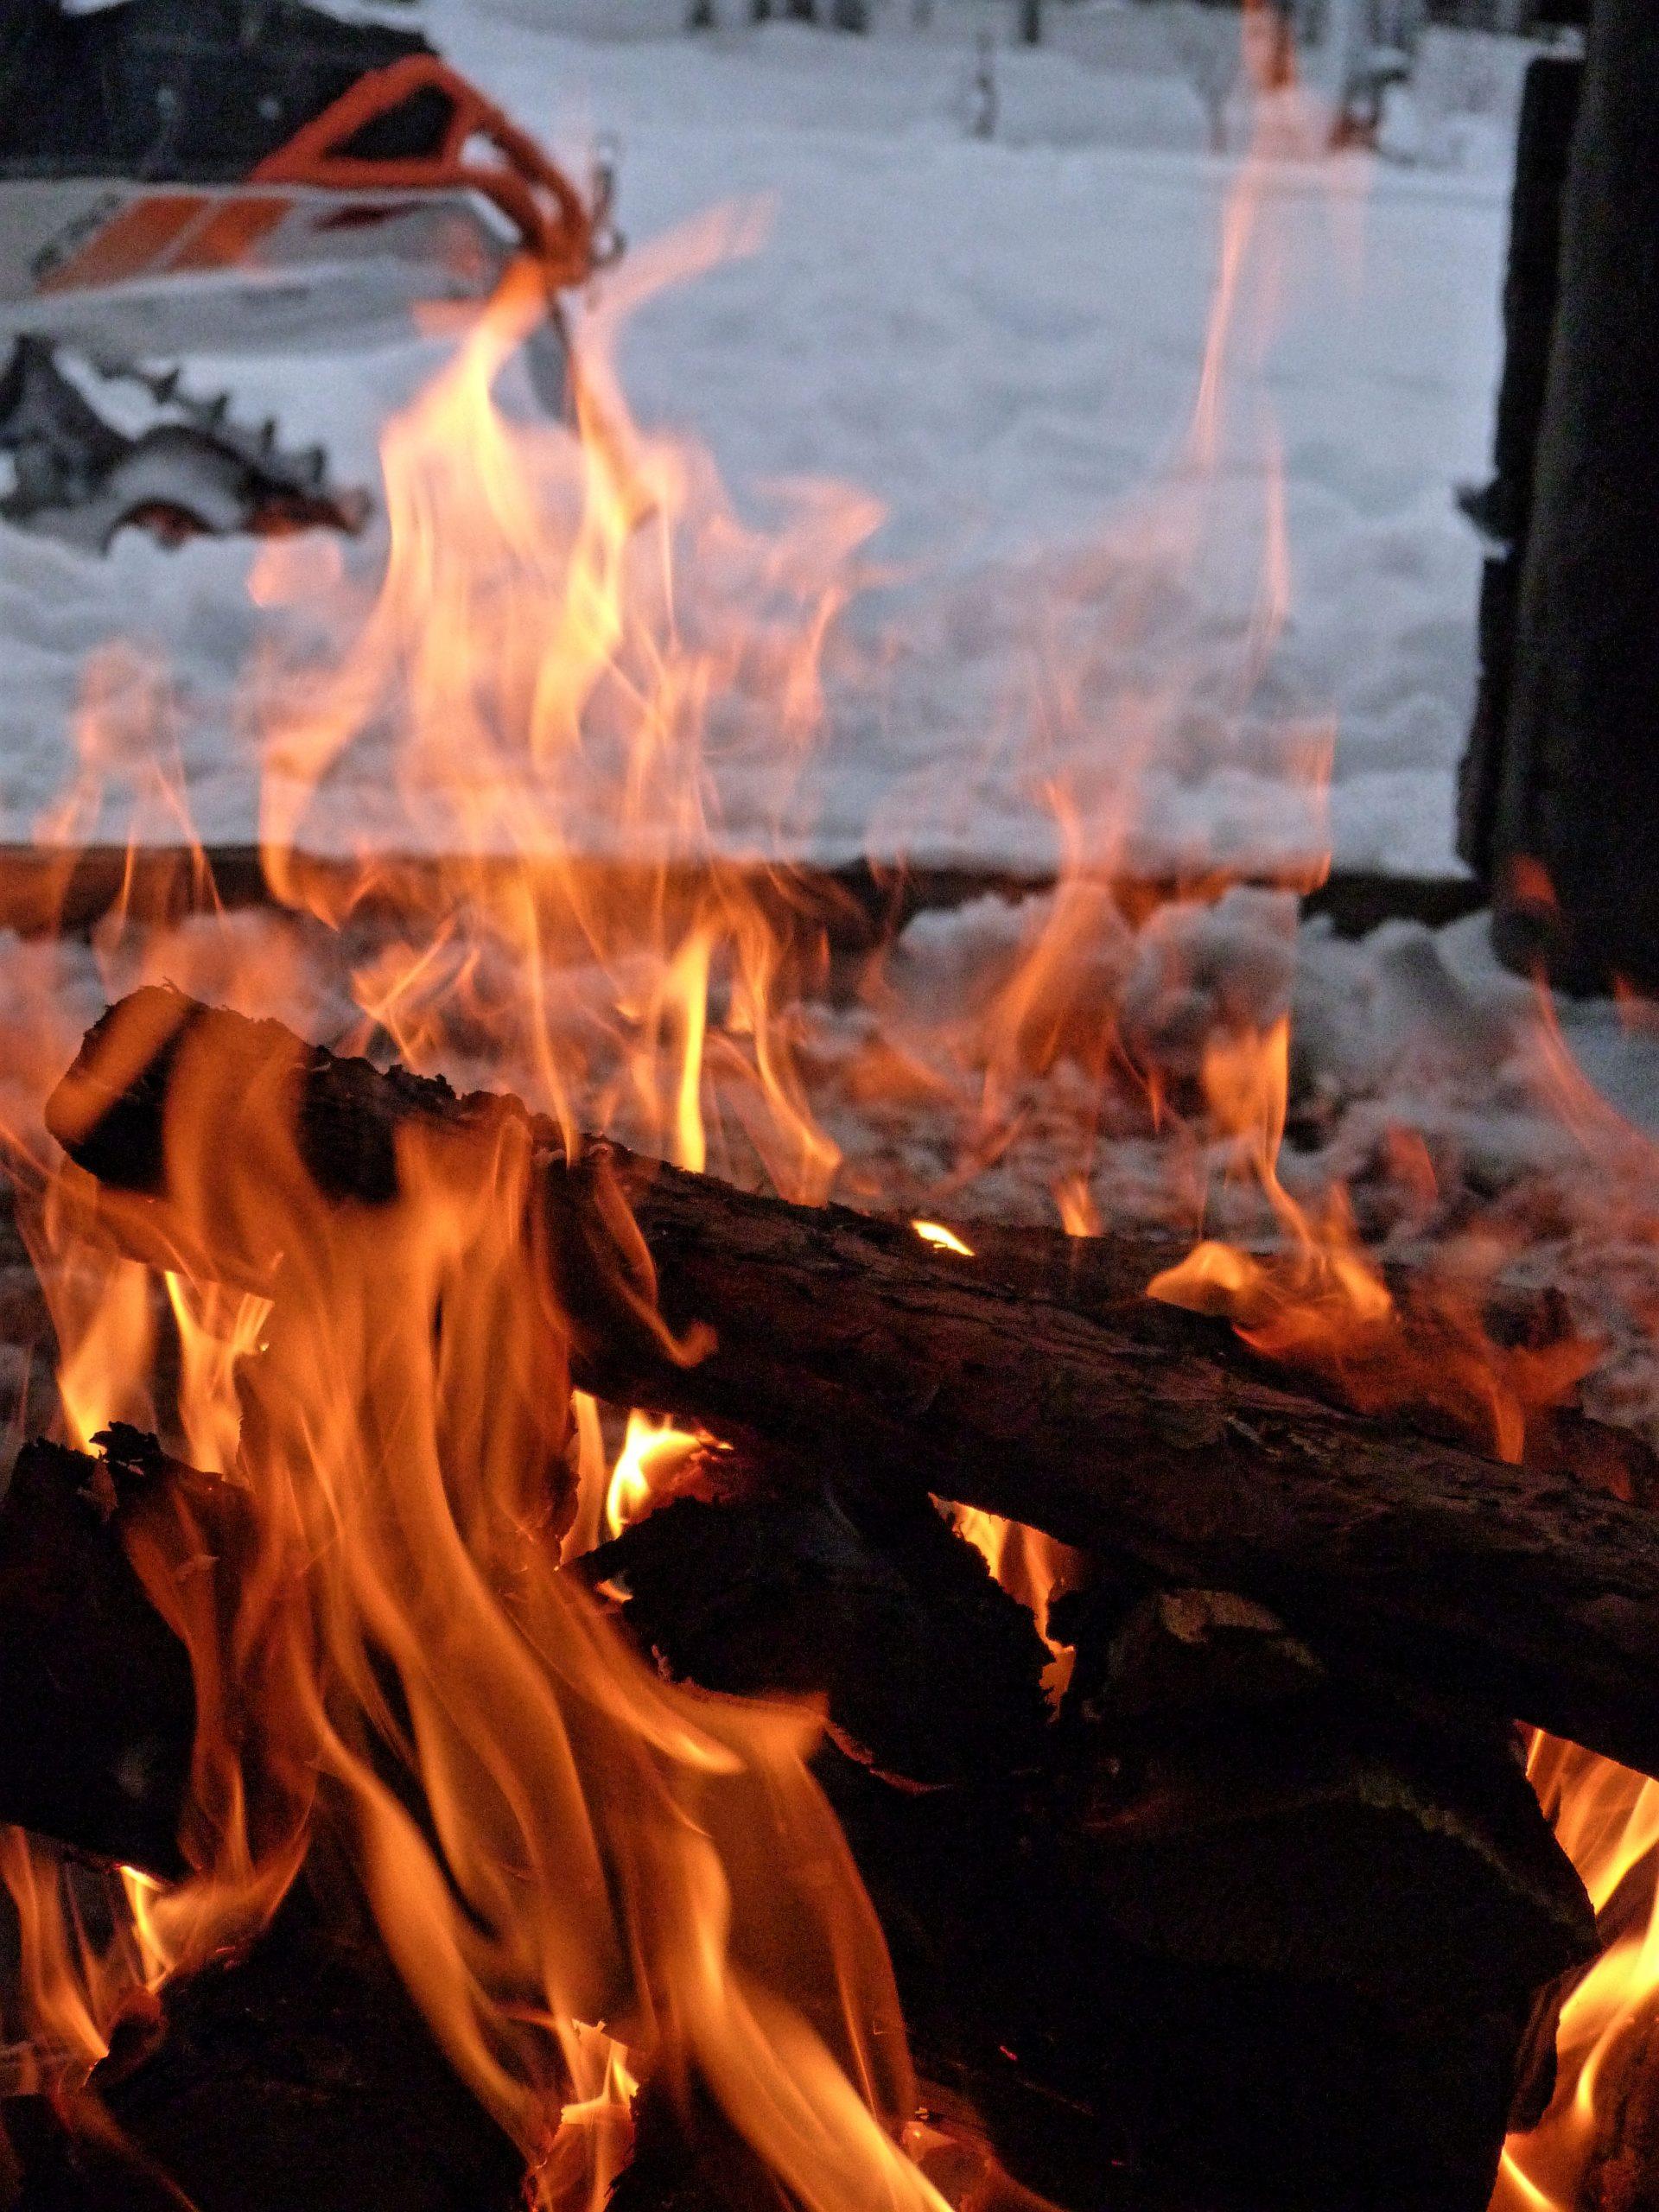 JokkmokkArcticDream-Snowmobile-fire